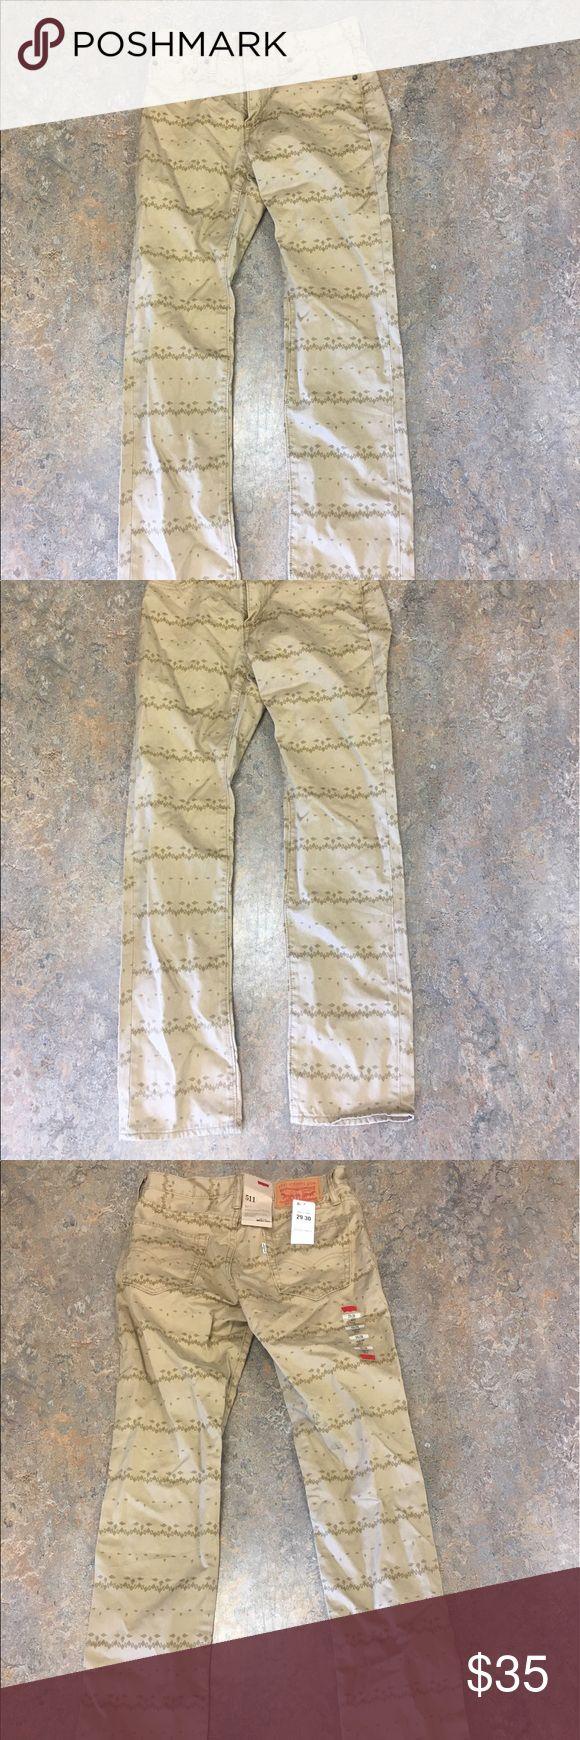 Levi's 511 Slim Fit Tribal Tan 29x30 Men's Jeans Levi's 511 Slim Fit Tribal Tan 29x30 Jeans. Levi's Jeans Slim